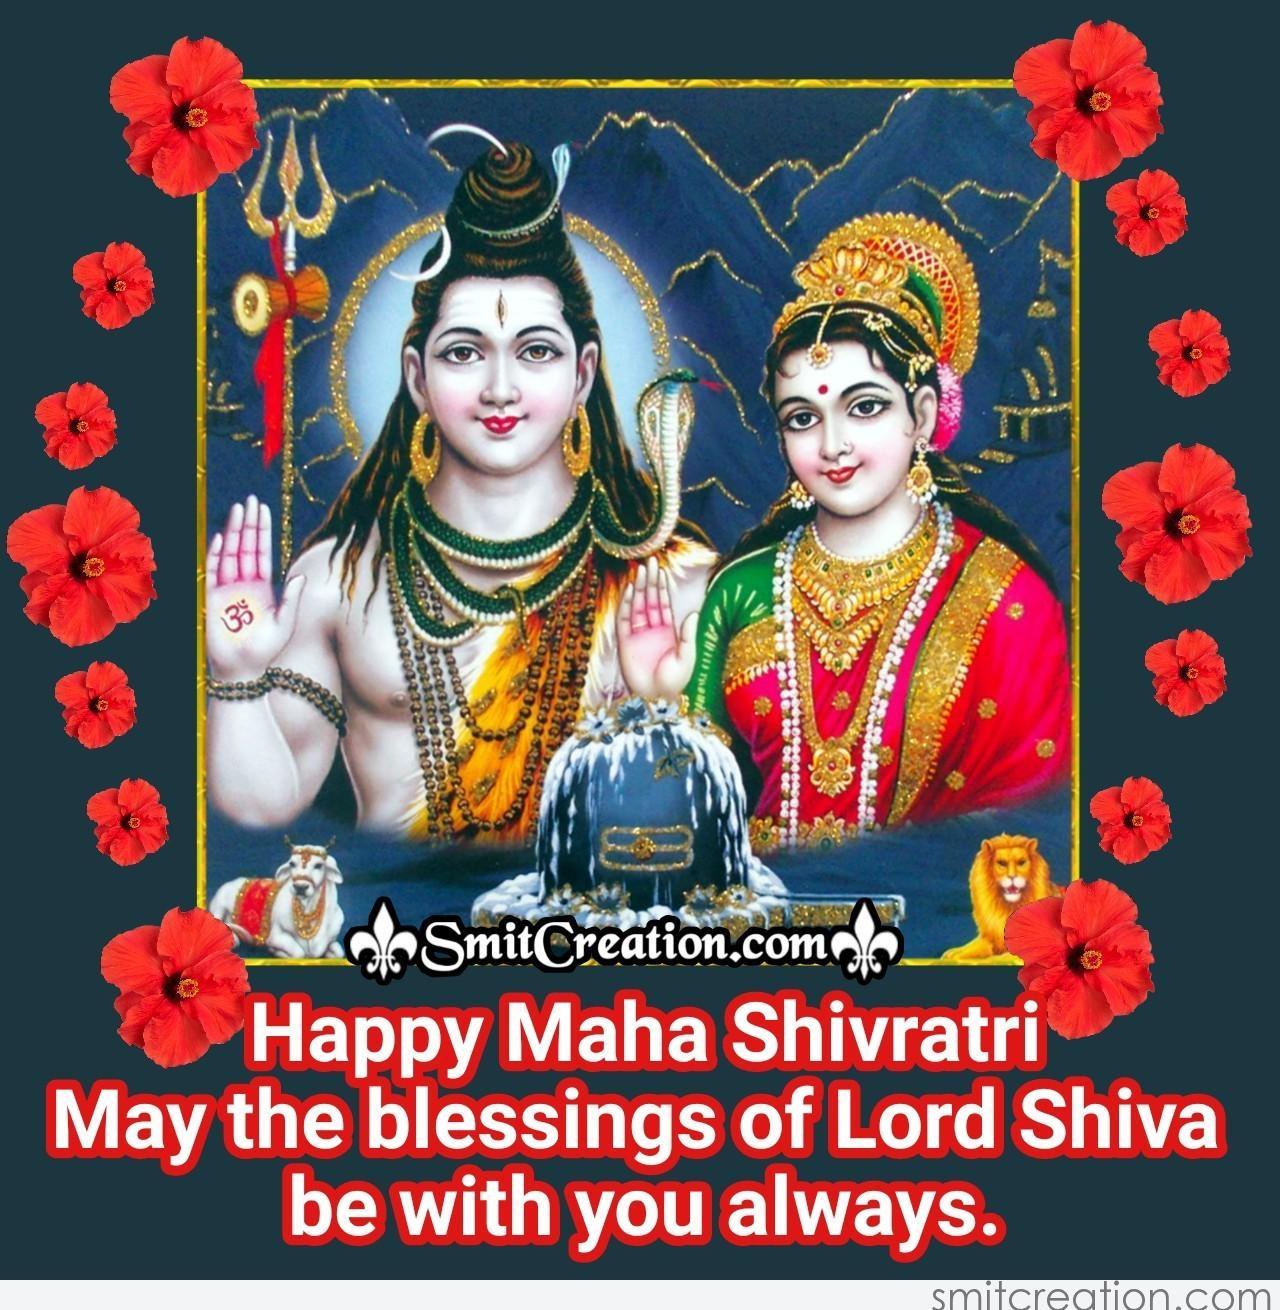 Maha Shivratri Blessings Of Lord Shiva